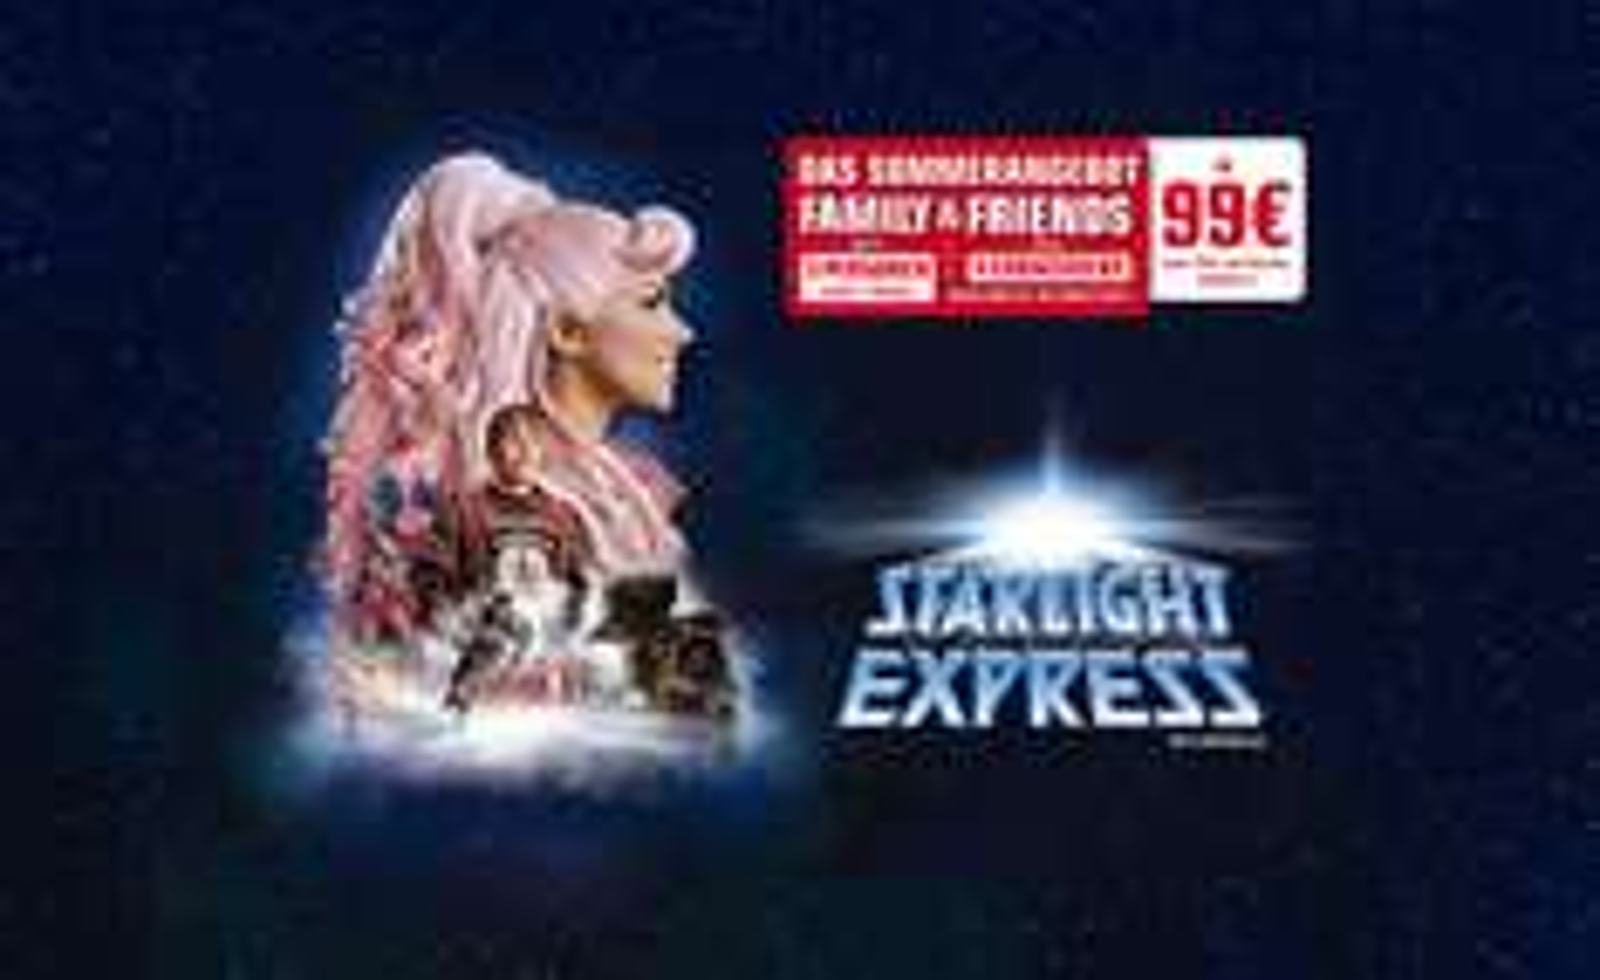 """ STARLIGHT EXPRESS "" 5 Musical Tickets (mind.2 Kinder bis 14J.) oder 4 Erw. ab 99€"